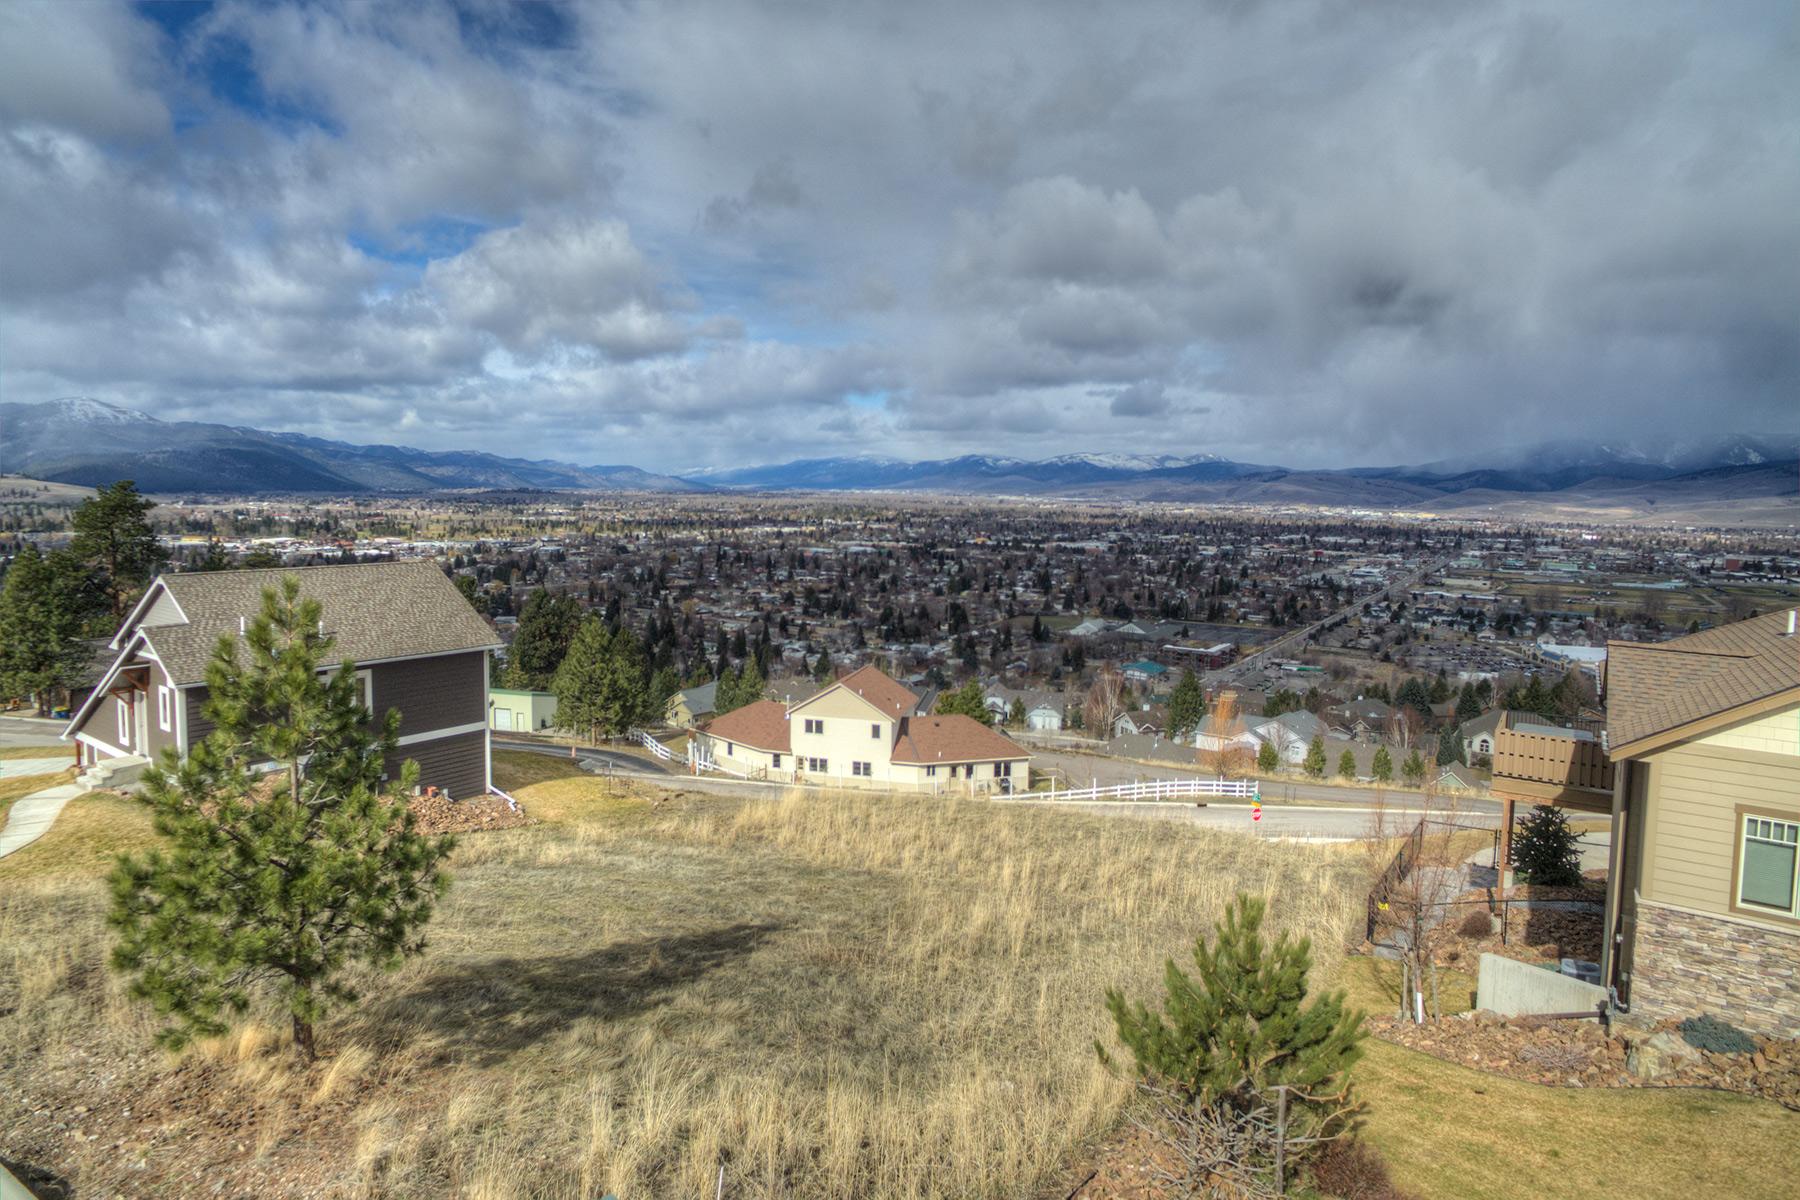 Terreno para Venda às NHN Landons Way Nhn Landons Way Missoula, Montana, 59803 Estados Unidos